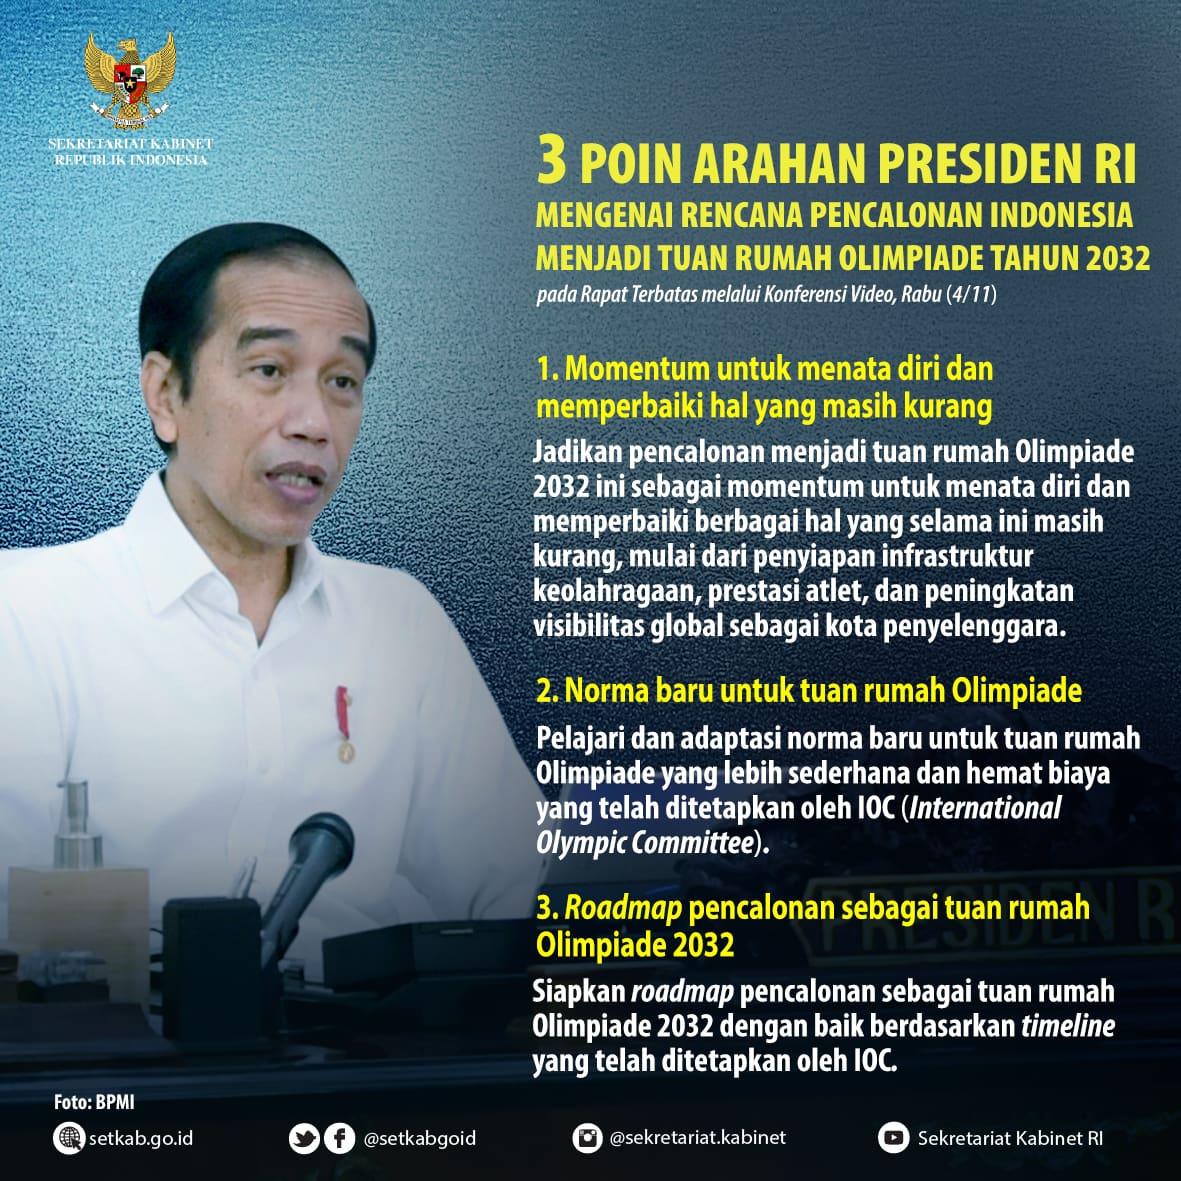 "Arahan Presiden Joko Widodo pada Rapat Terbatas ""Rencana Pencalonan Indonesia Menjadi Tuan Rumah Olimpiade Tahun 2032"", Rabu (4/11)"